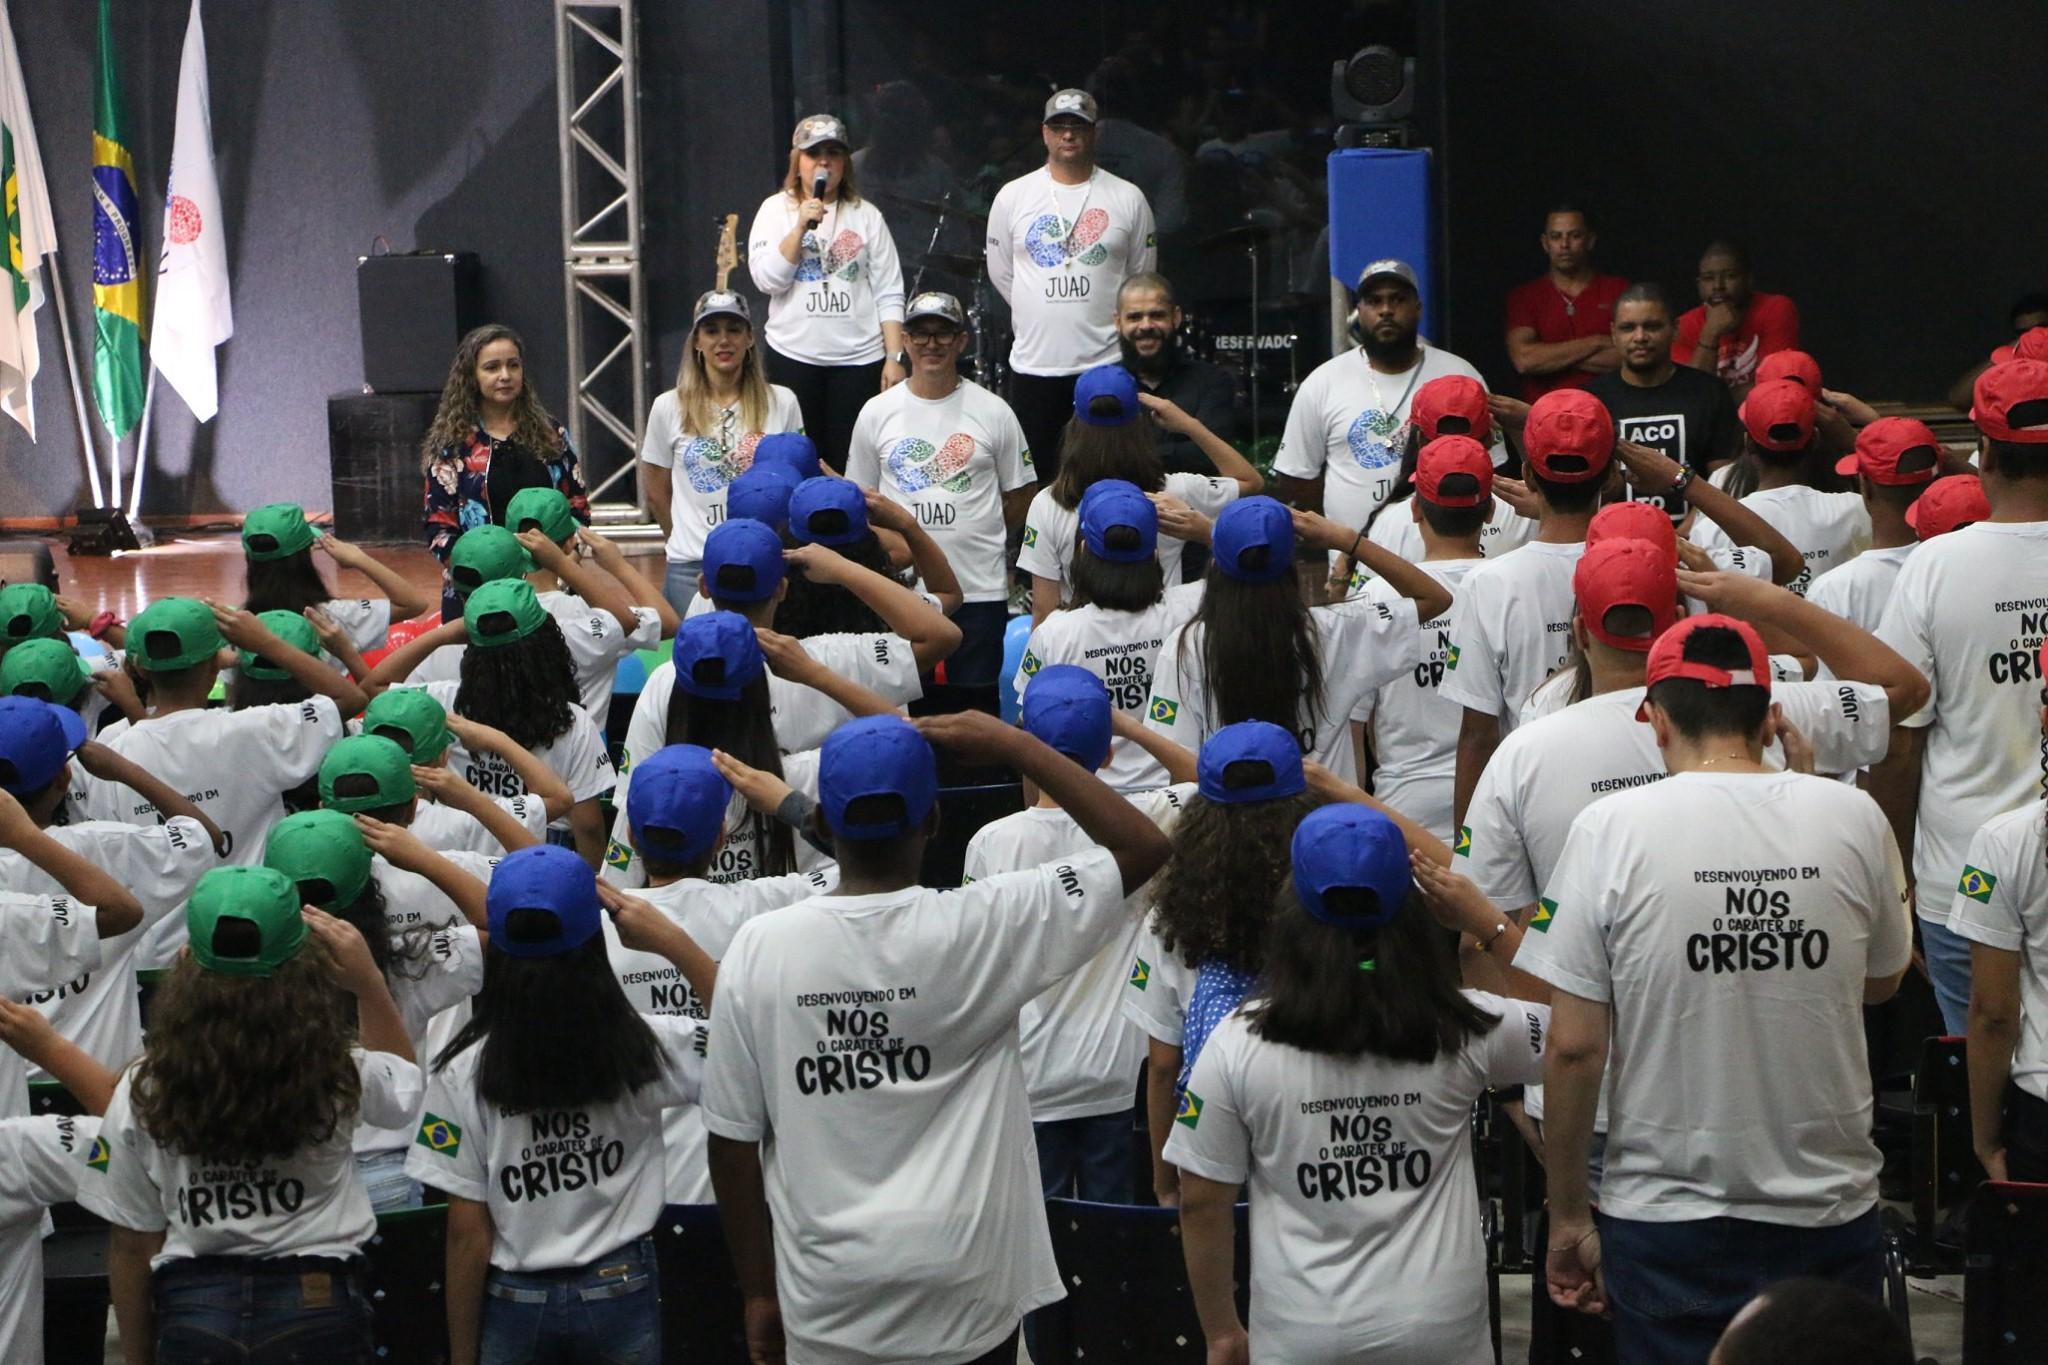 BASE JUAD SAMAMBAIA - BRASÍLIA/BR